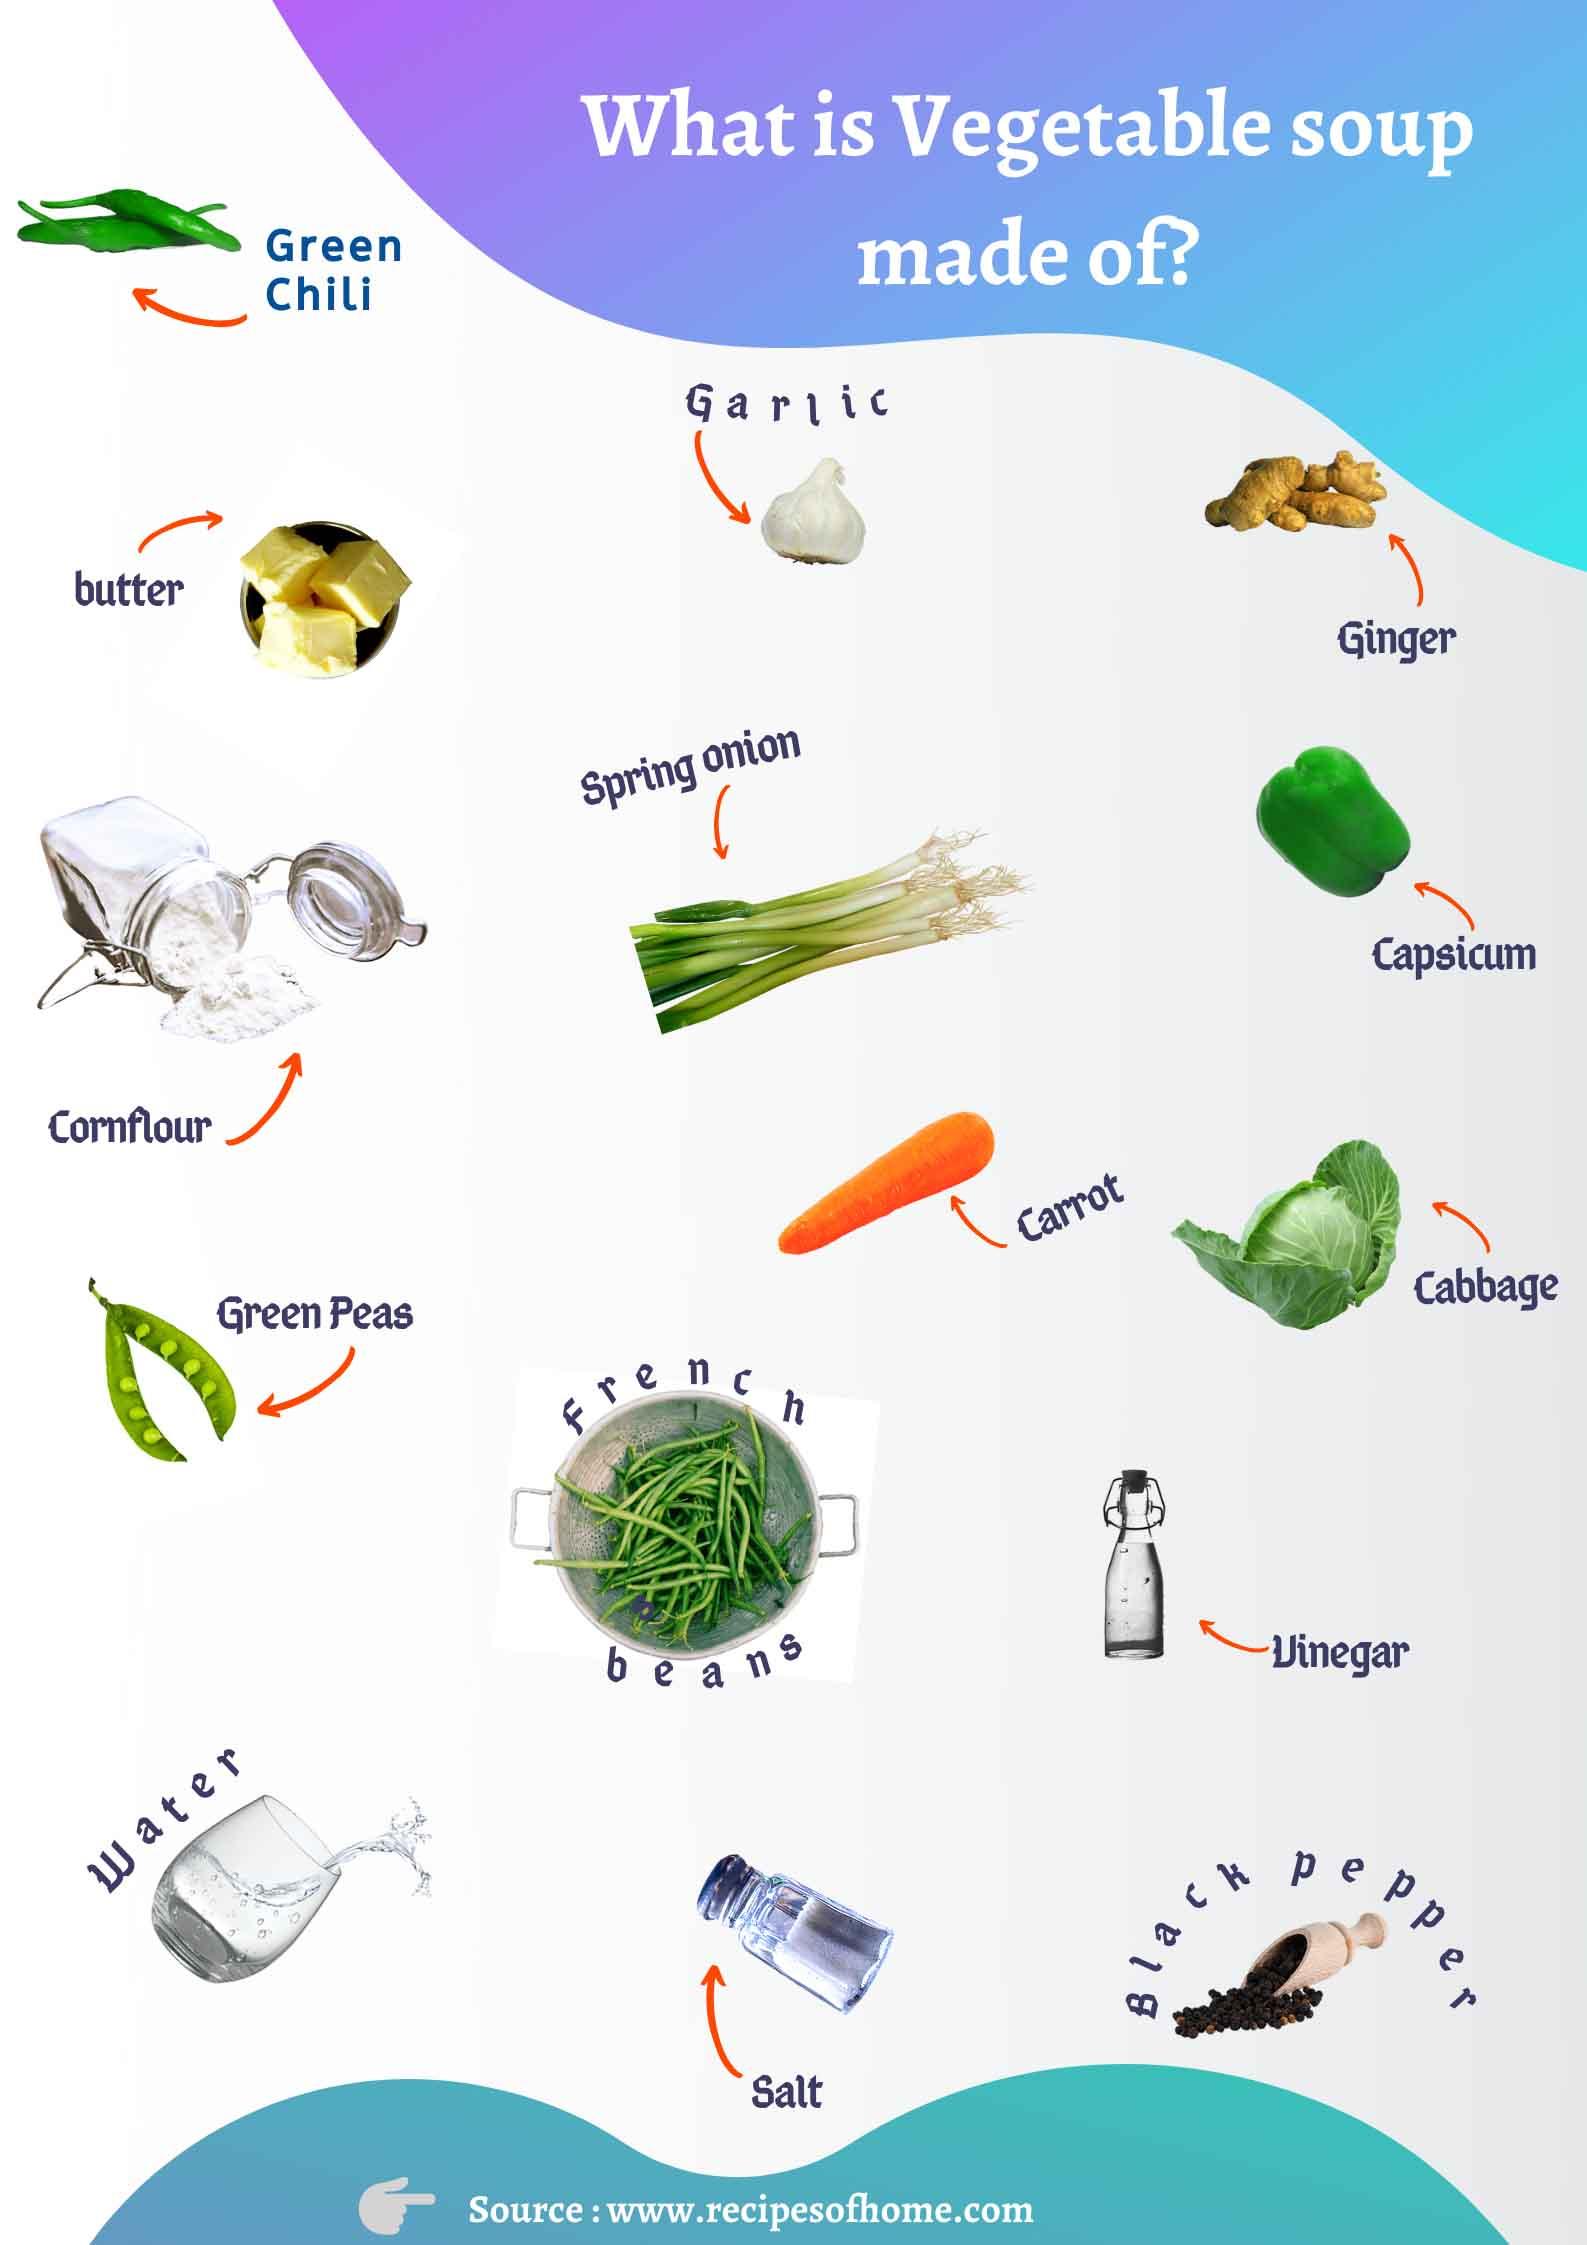 Ingredients-to-prepare-vegetable-soup-recipe